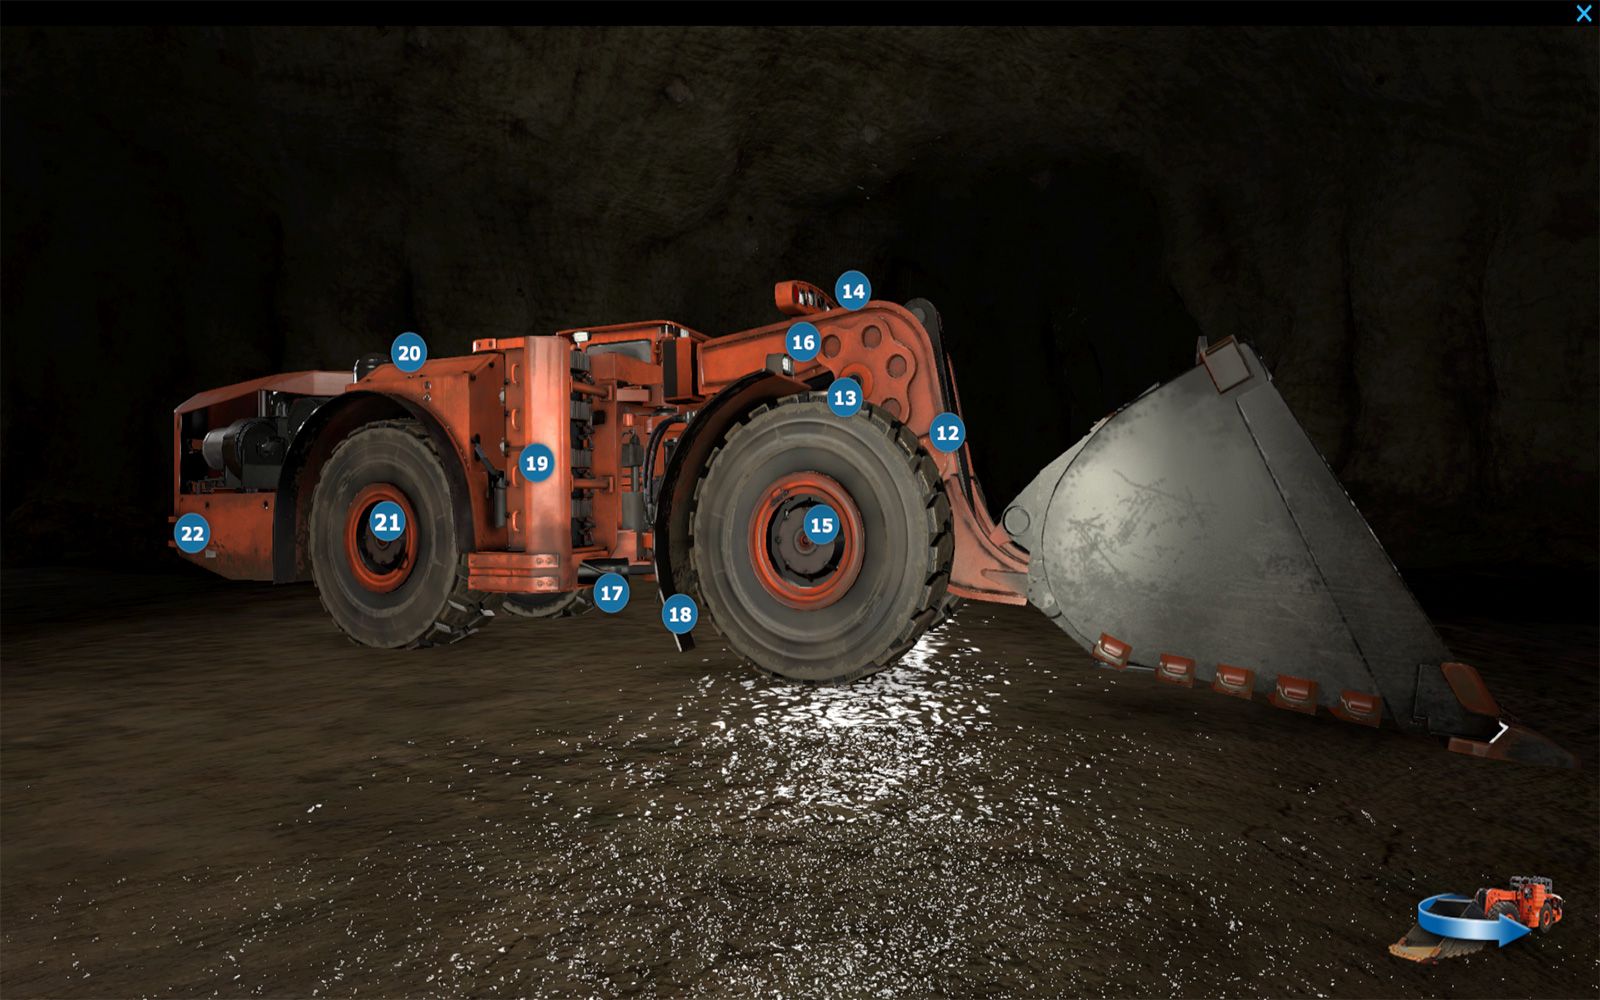 Komatsu Mining Simulator Inspection Points